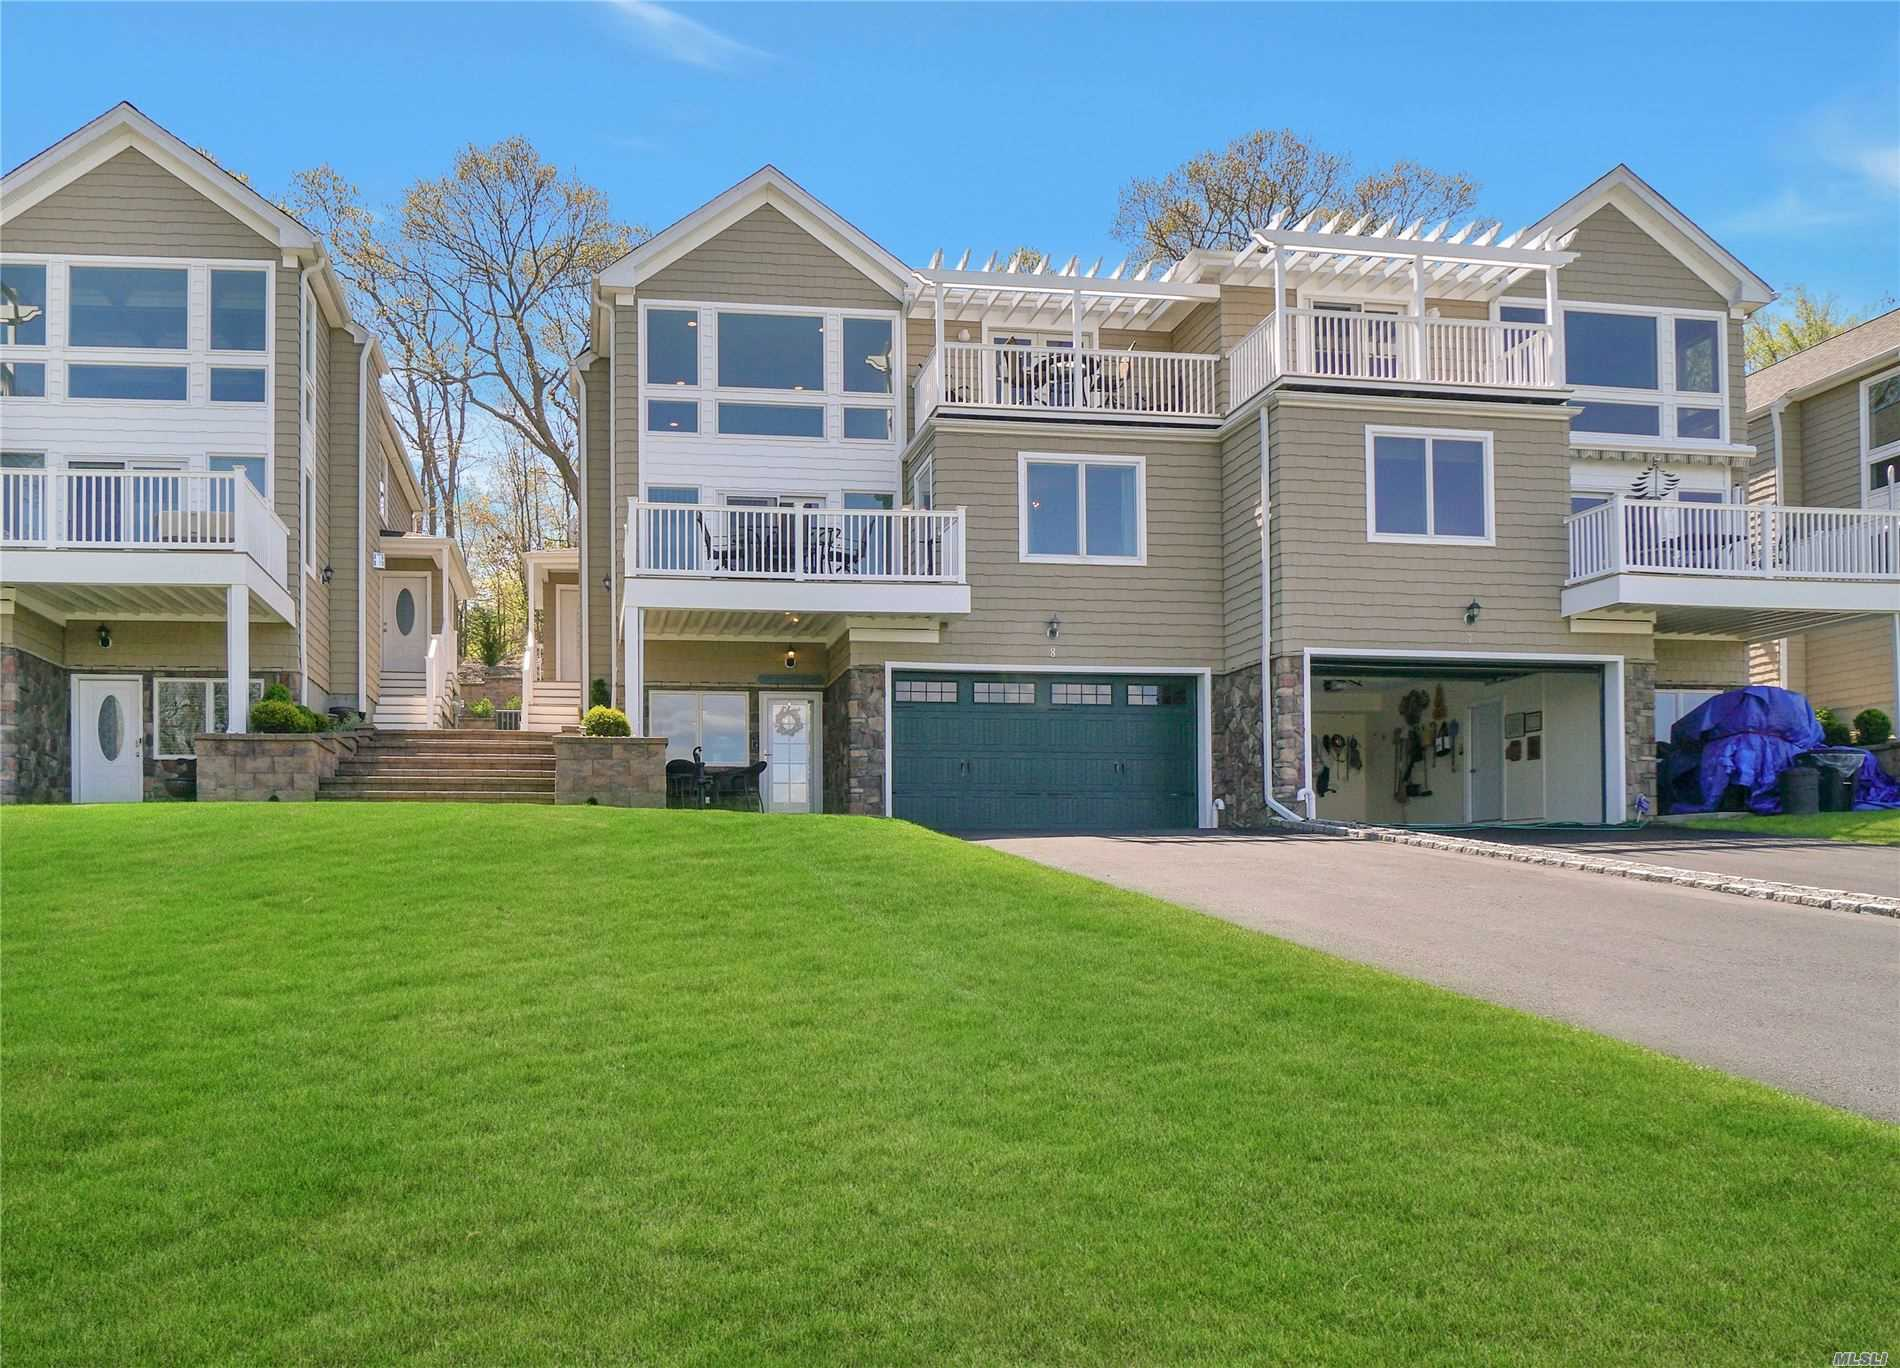 Property for sale at 8 Theresa Lane # 8, Port Jefferson NY 11777, Port Jefferson,  New York 11777